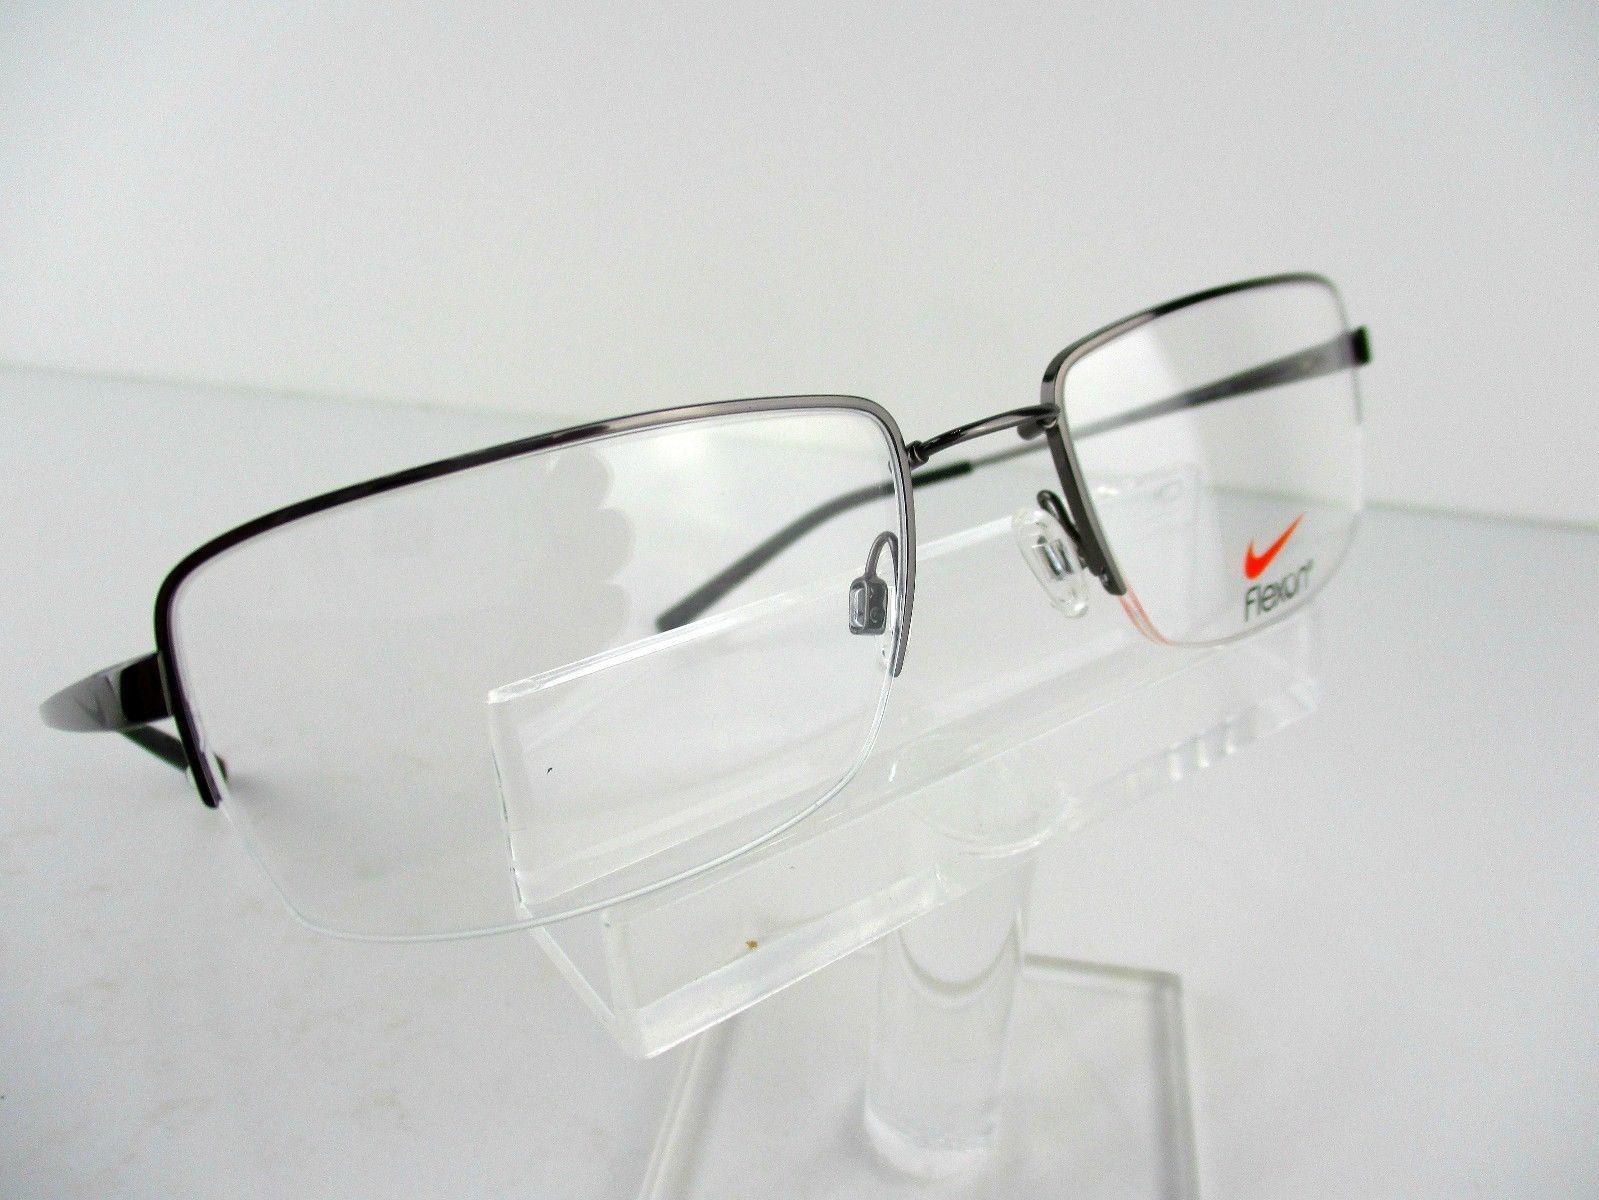 977b3d8ebdb Nike FLEXON 4195 (010) Dark Gray   Black 56 x 19 145 Eyeglass Frames -   84.60